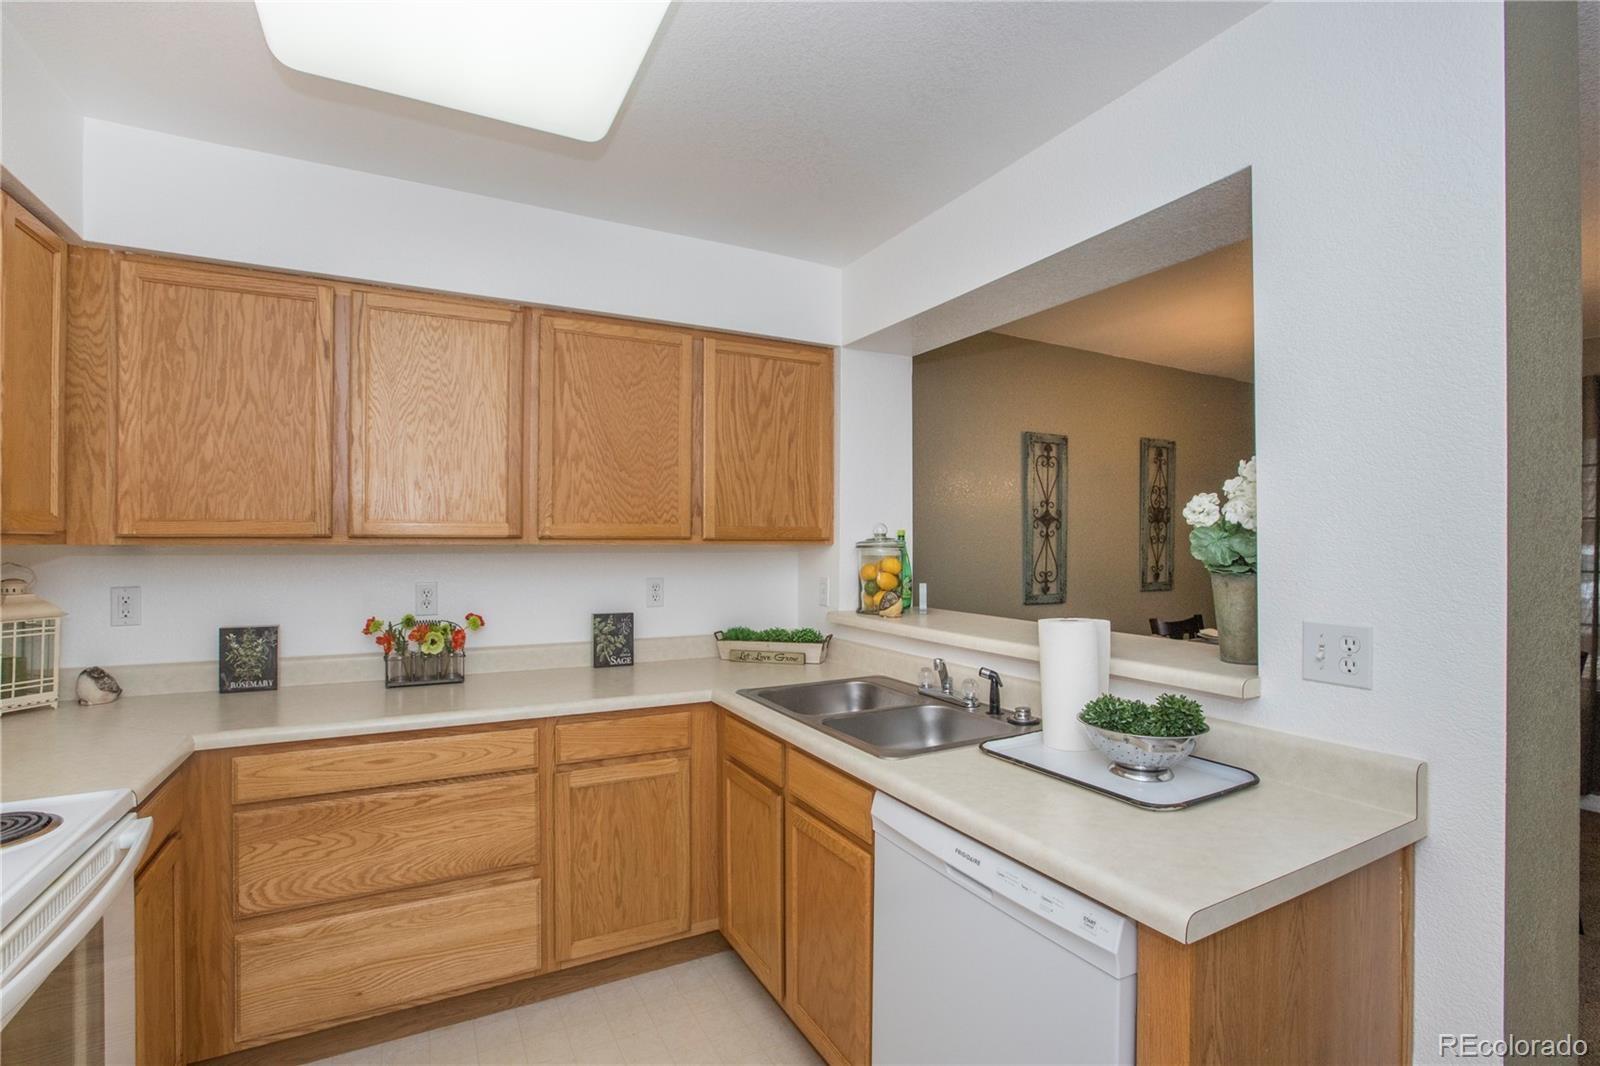 MLS# 3758449 - 13 - 6802 Antigua Drive #26, Fort Collins, CO 80525